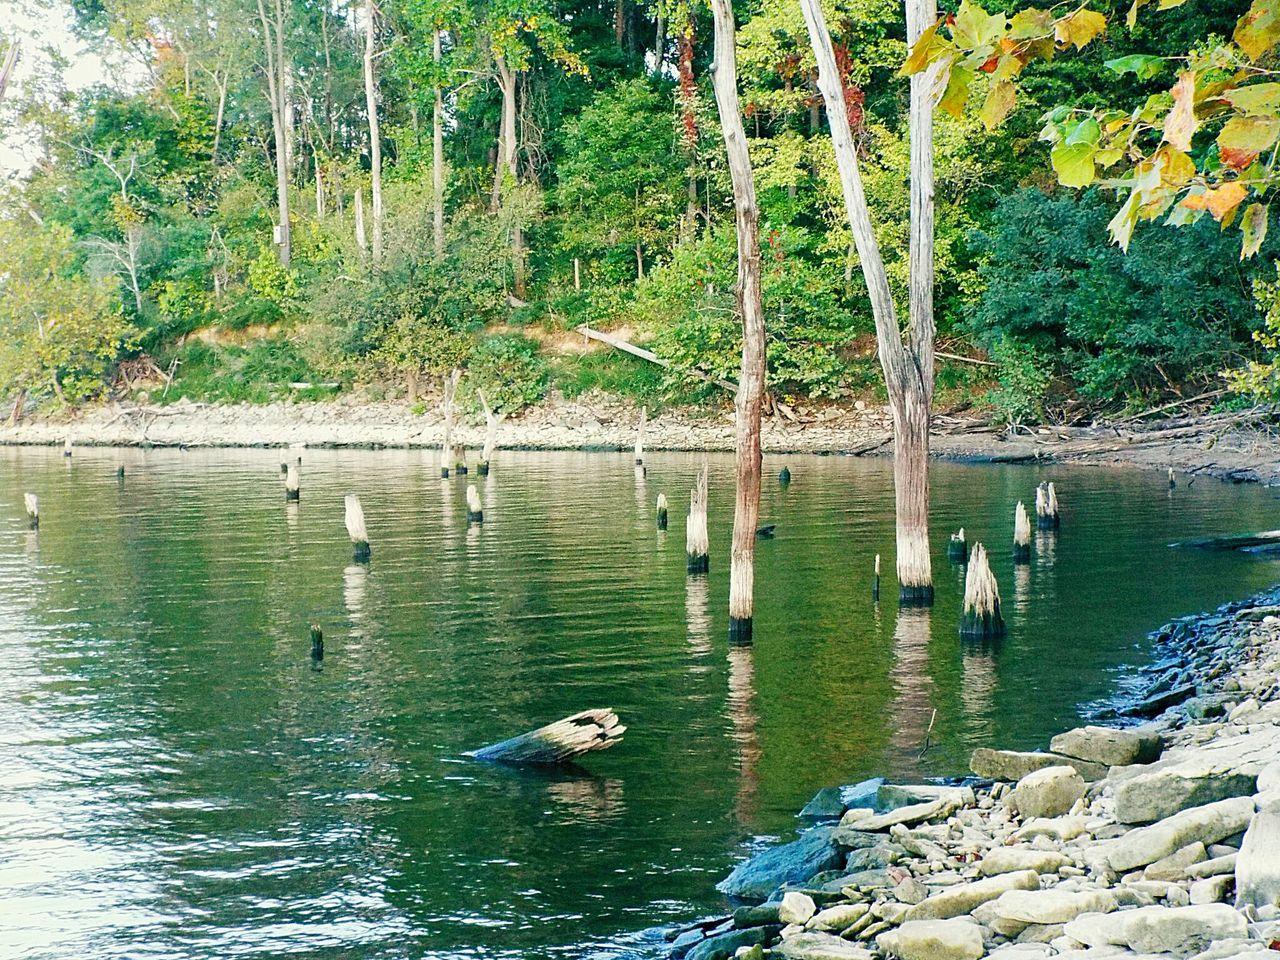 water, animal themes, animals in the wild, nature, lake, tree, swimming, day, one animal, outdoors, duck, waterfront, beauty in nature, bird, no people, animal wildlife, water bird, swan, scenics, mammal